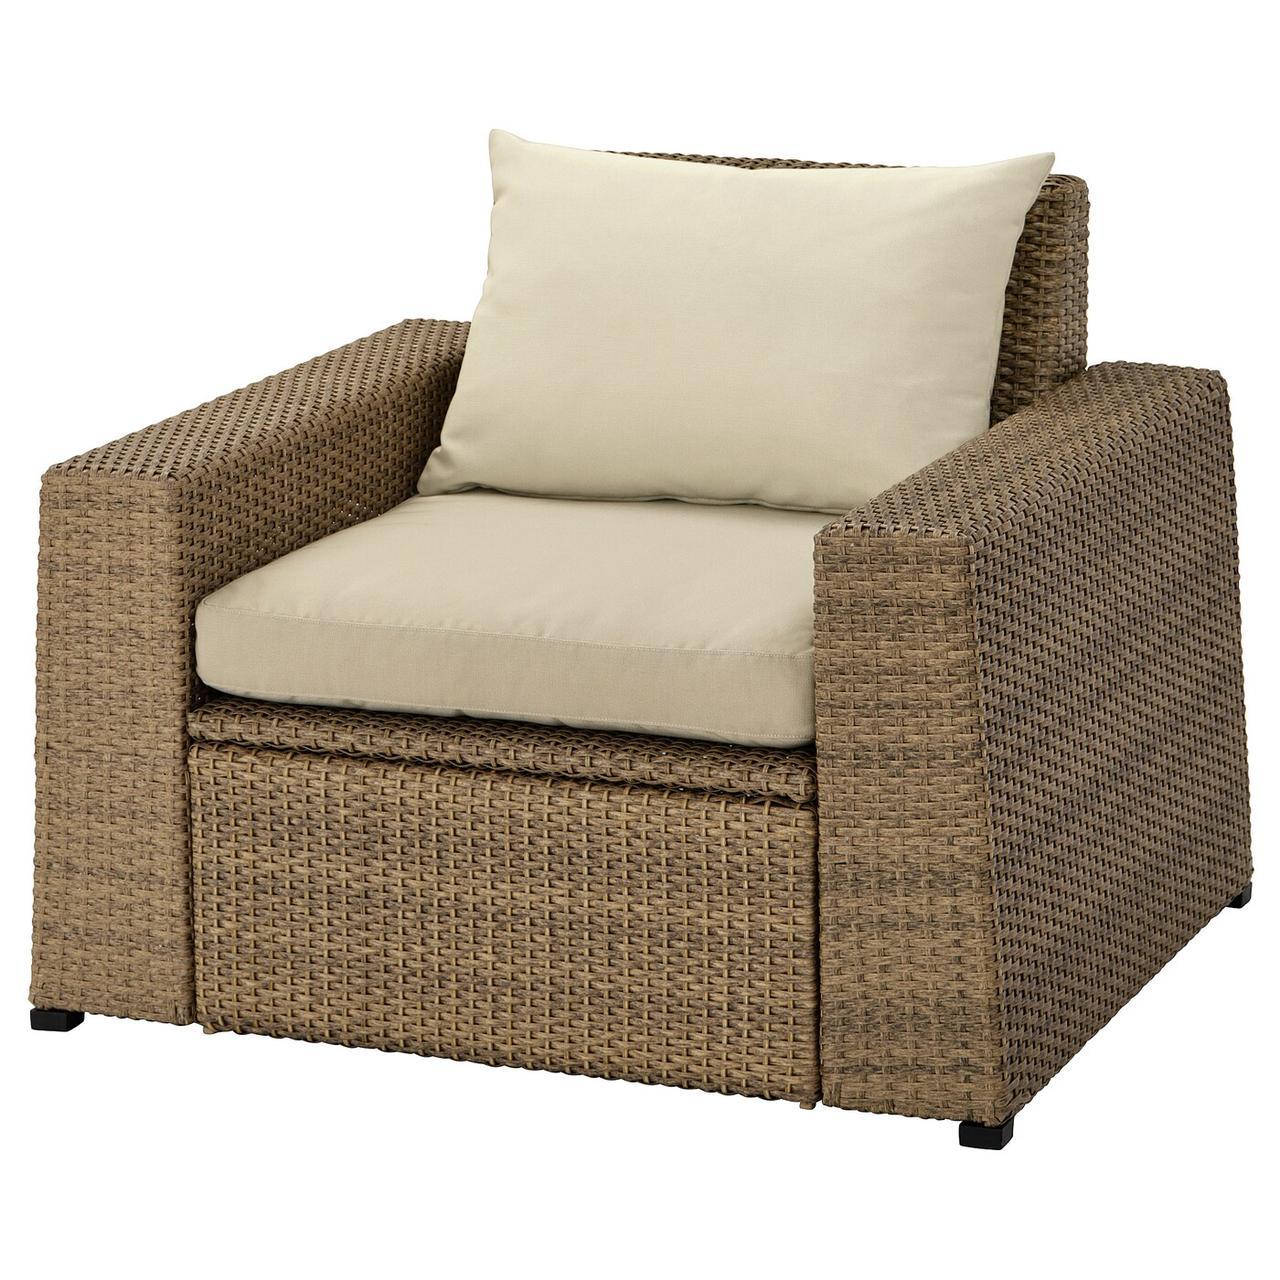 IKEA Садовое кресло SOLLERÖN (ИКЕА СОЛЛЕРОН) 192.415.04